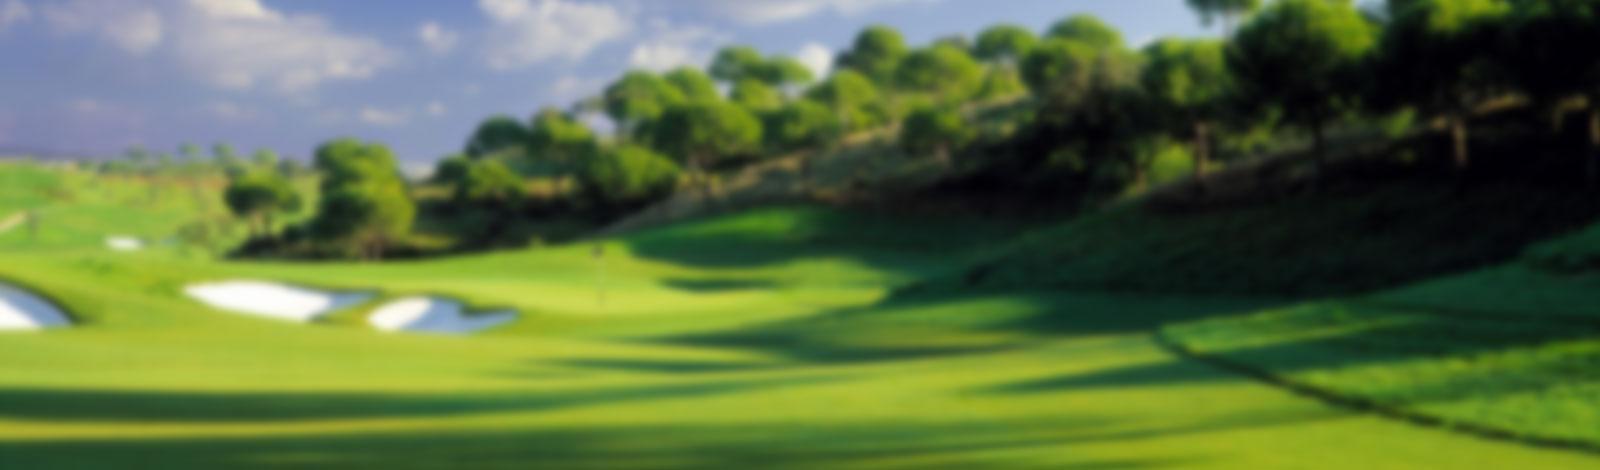 golf-back